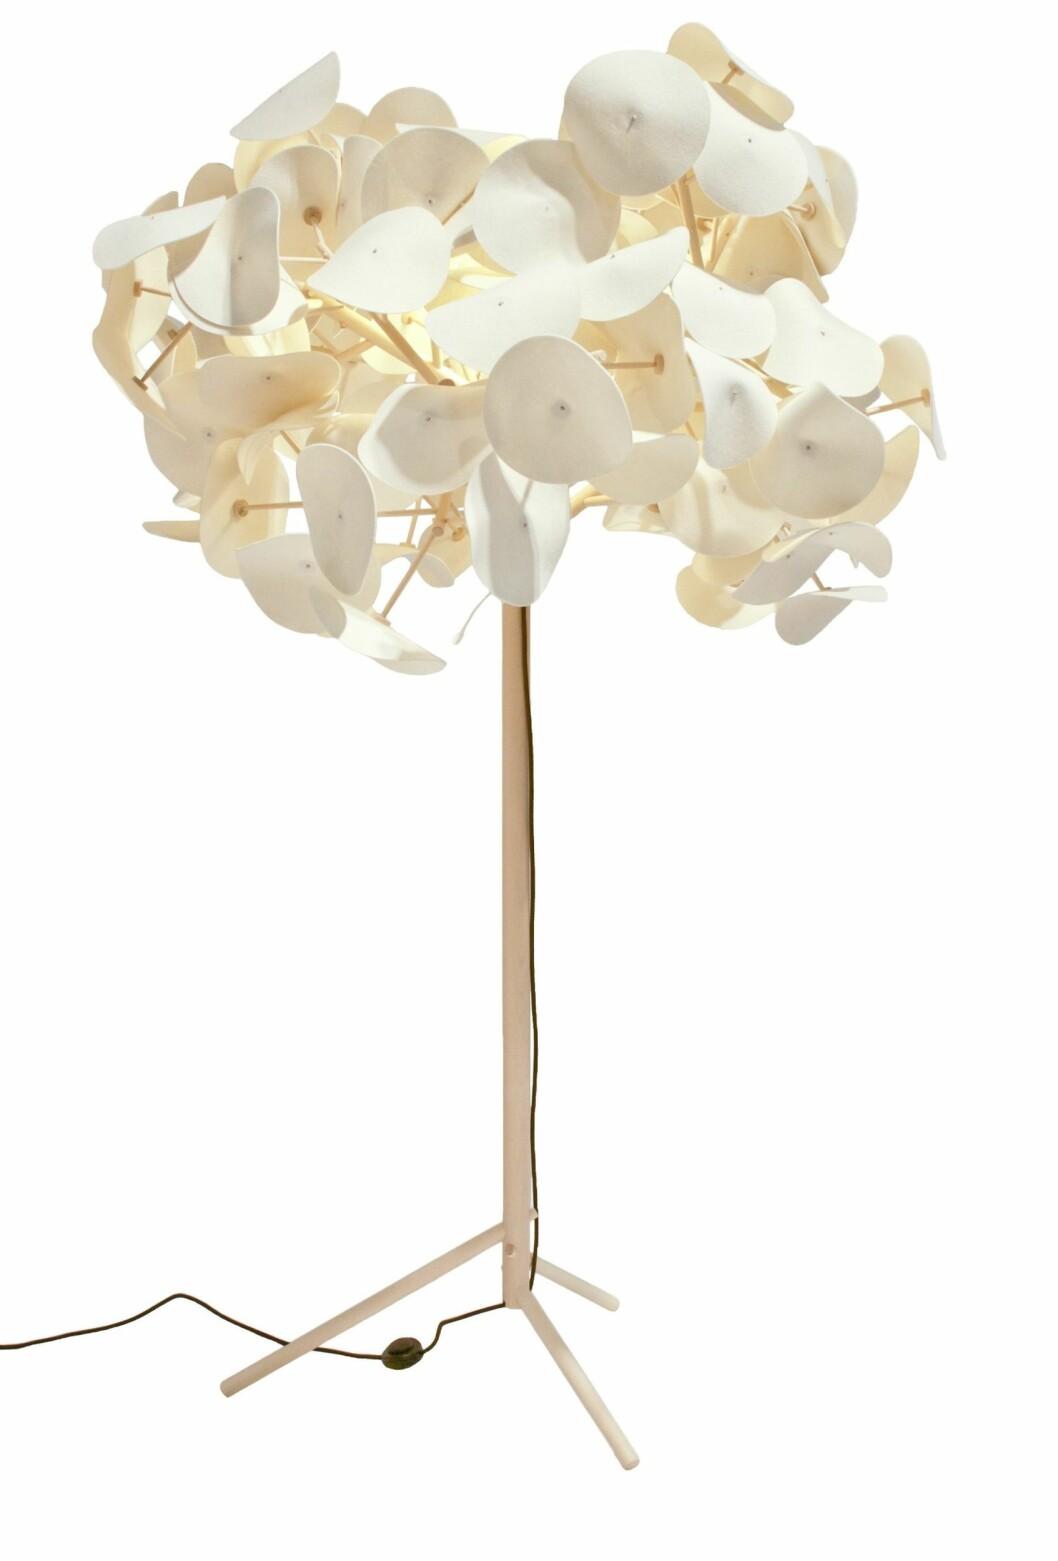 Denne prisbelønte lampen bringer virkelig naturen inn i stuen. Leaf Lamp, kr 13 800, greenfurniture.se. Foto: Produsenten